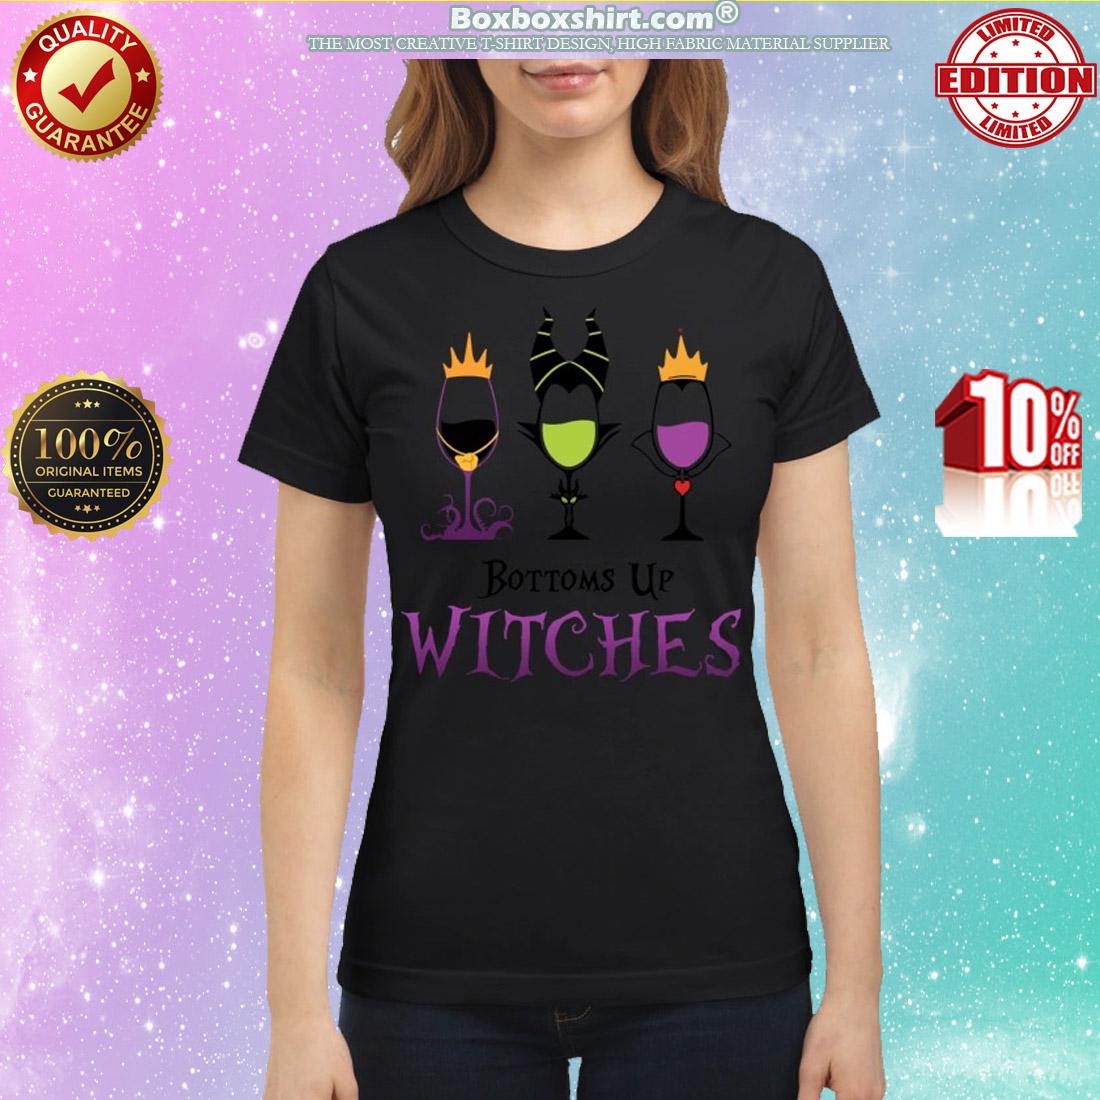 Bottoms up witches Hocus Pocus shirt